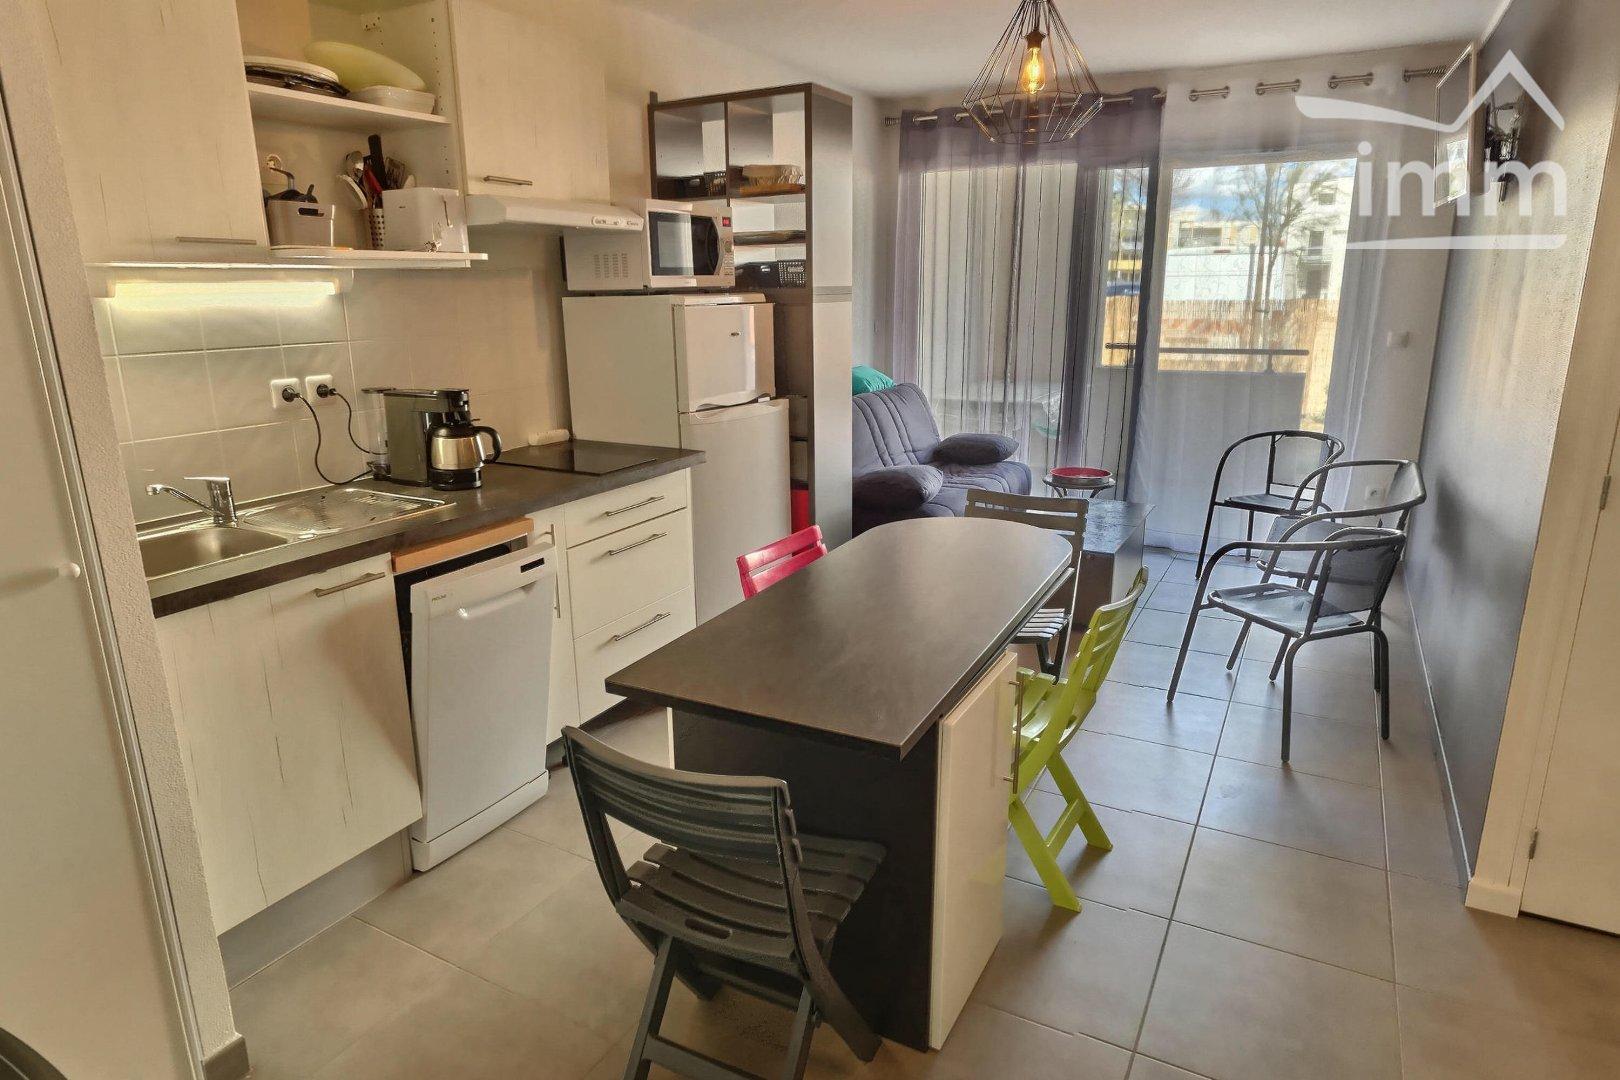 Image - Appartement en résidence - SERIGNAN - Location Vacances - 32m² - IMMOPLAGE VALRAS-PLAGE